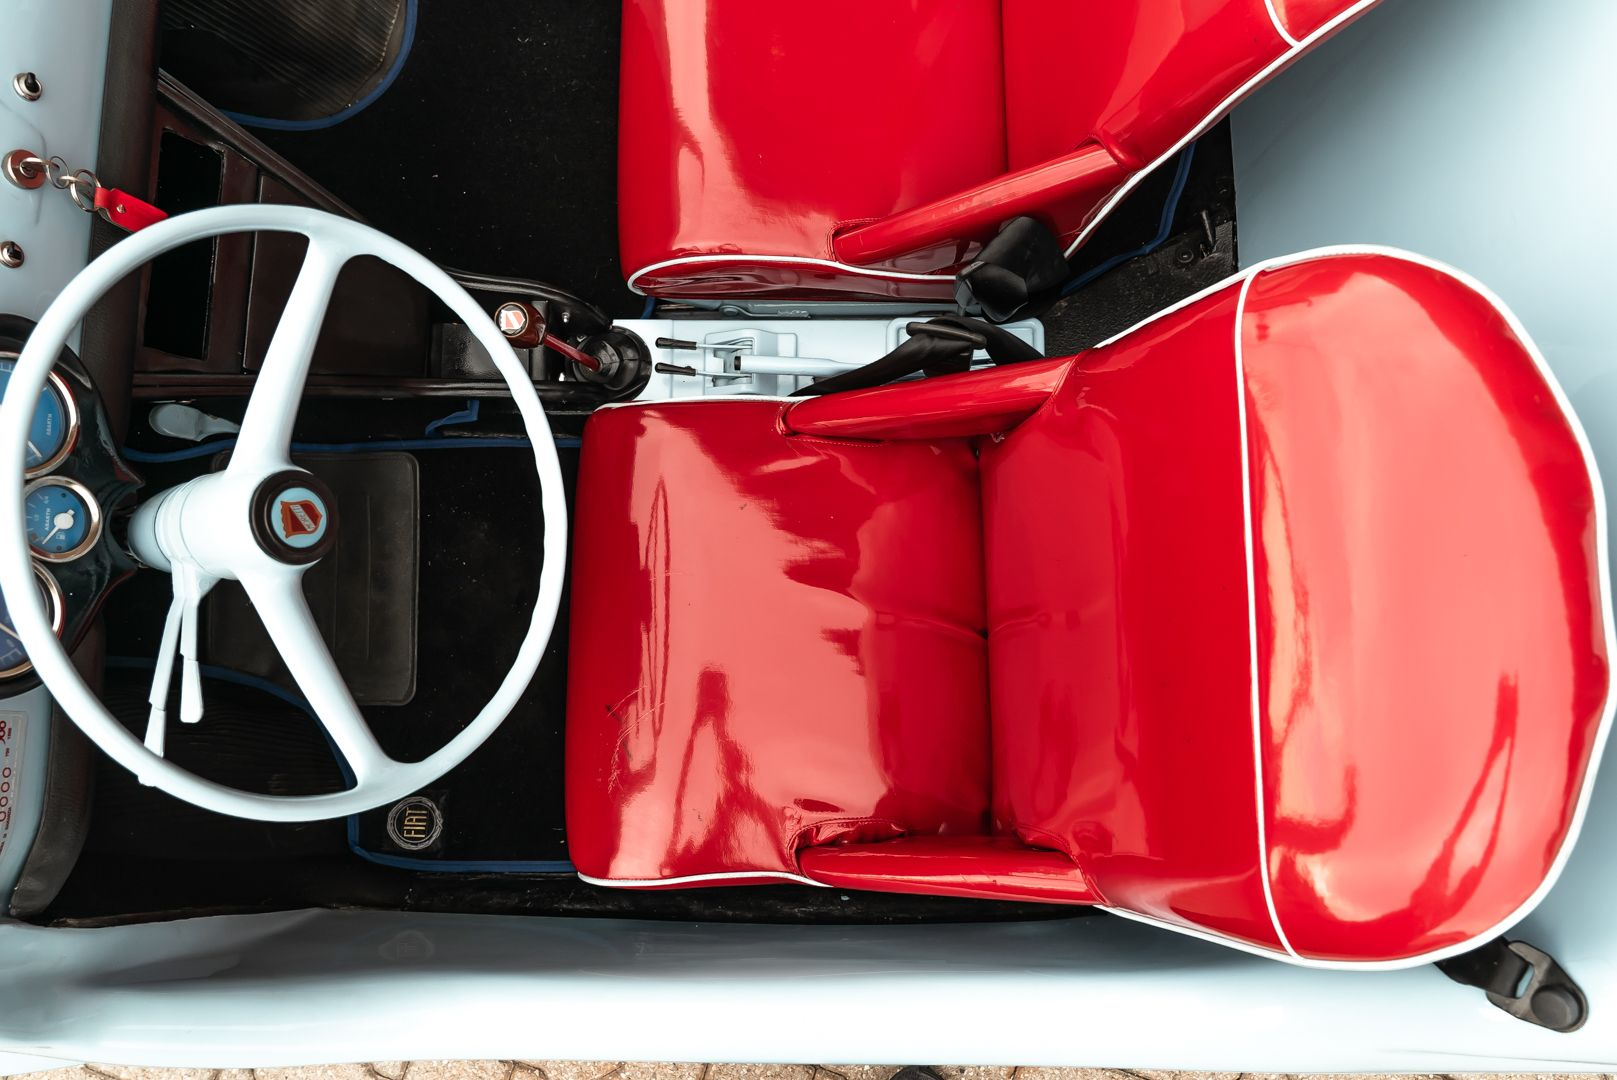 1971 Fiat 500 F Replica Speedster 80074